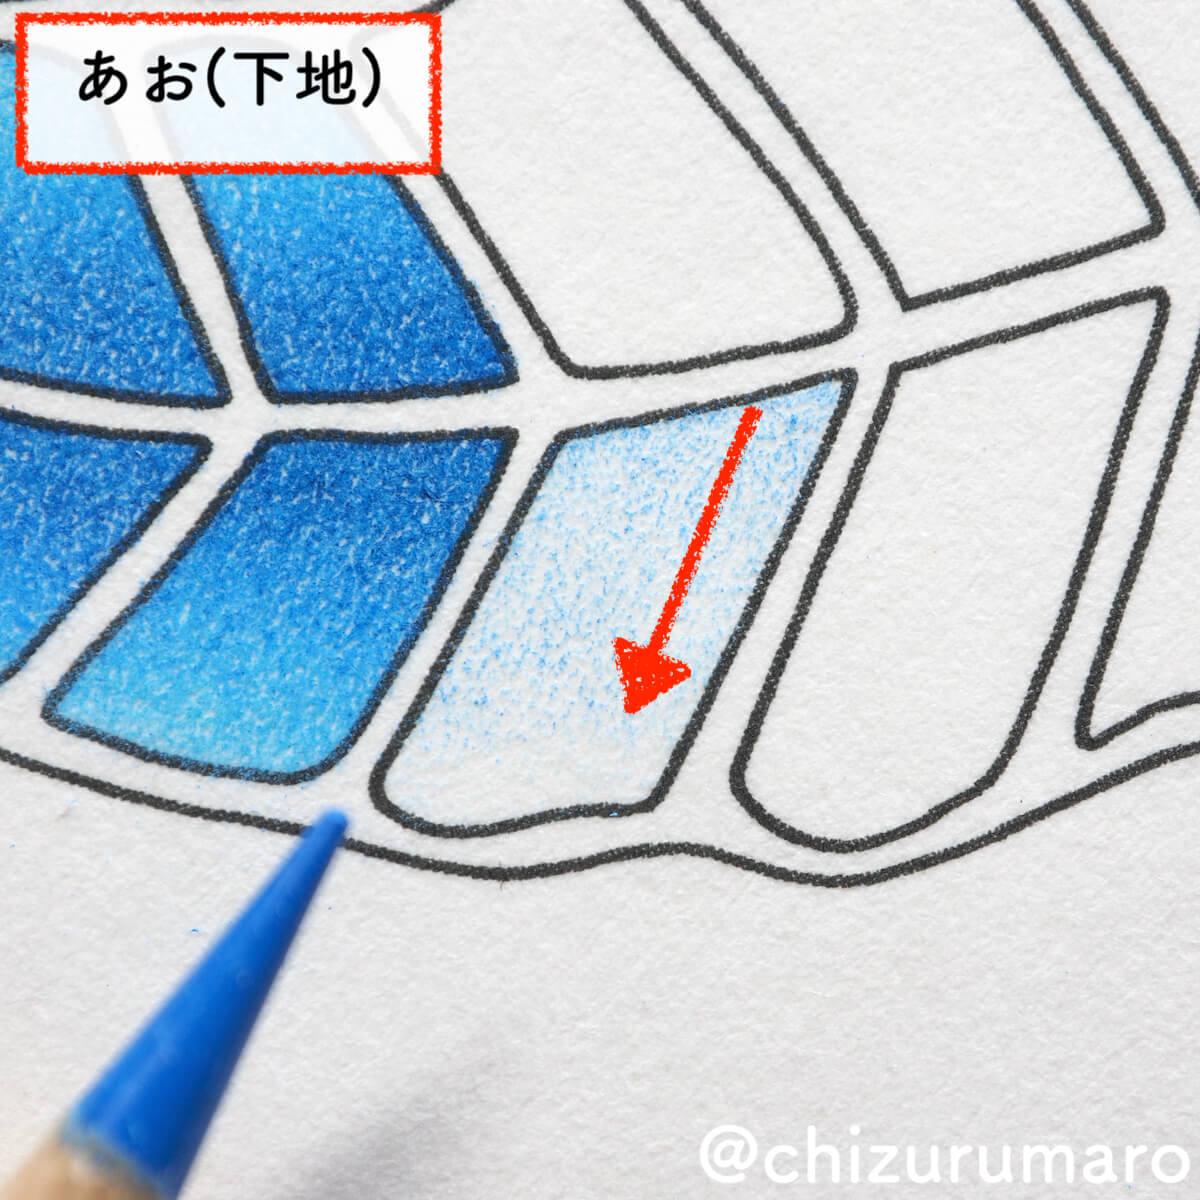 f:id:chizurumaro:20200616104245j:plain